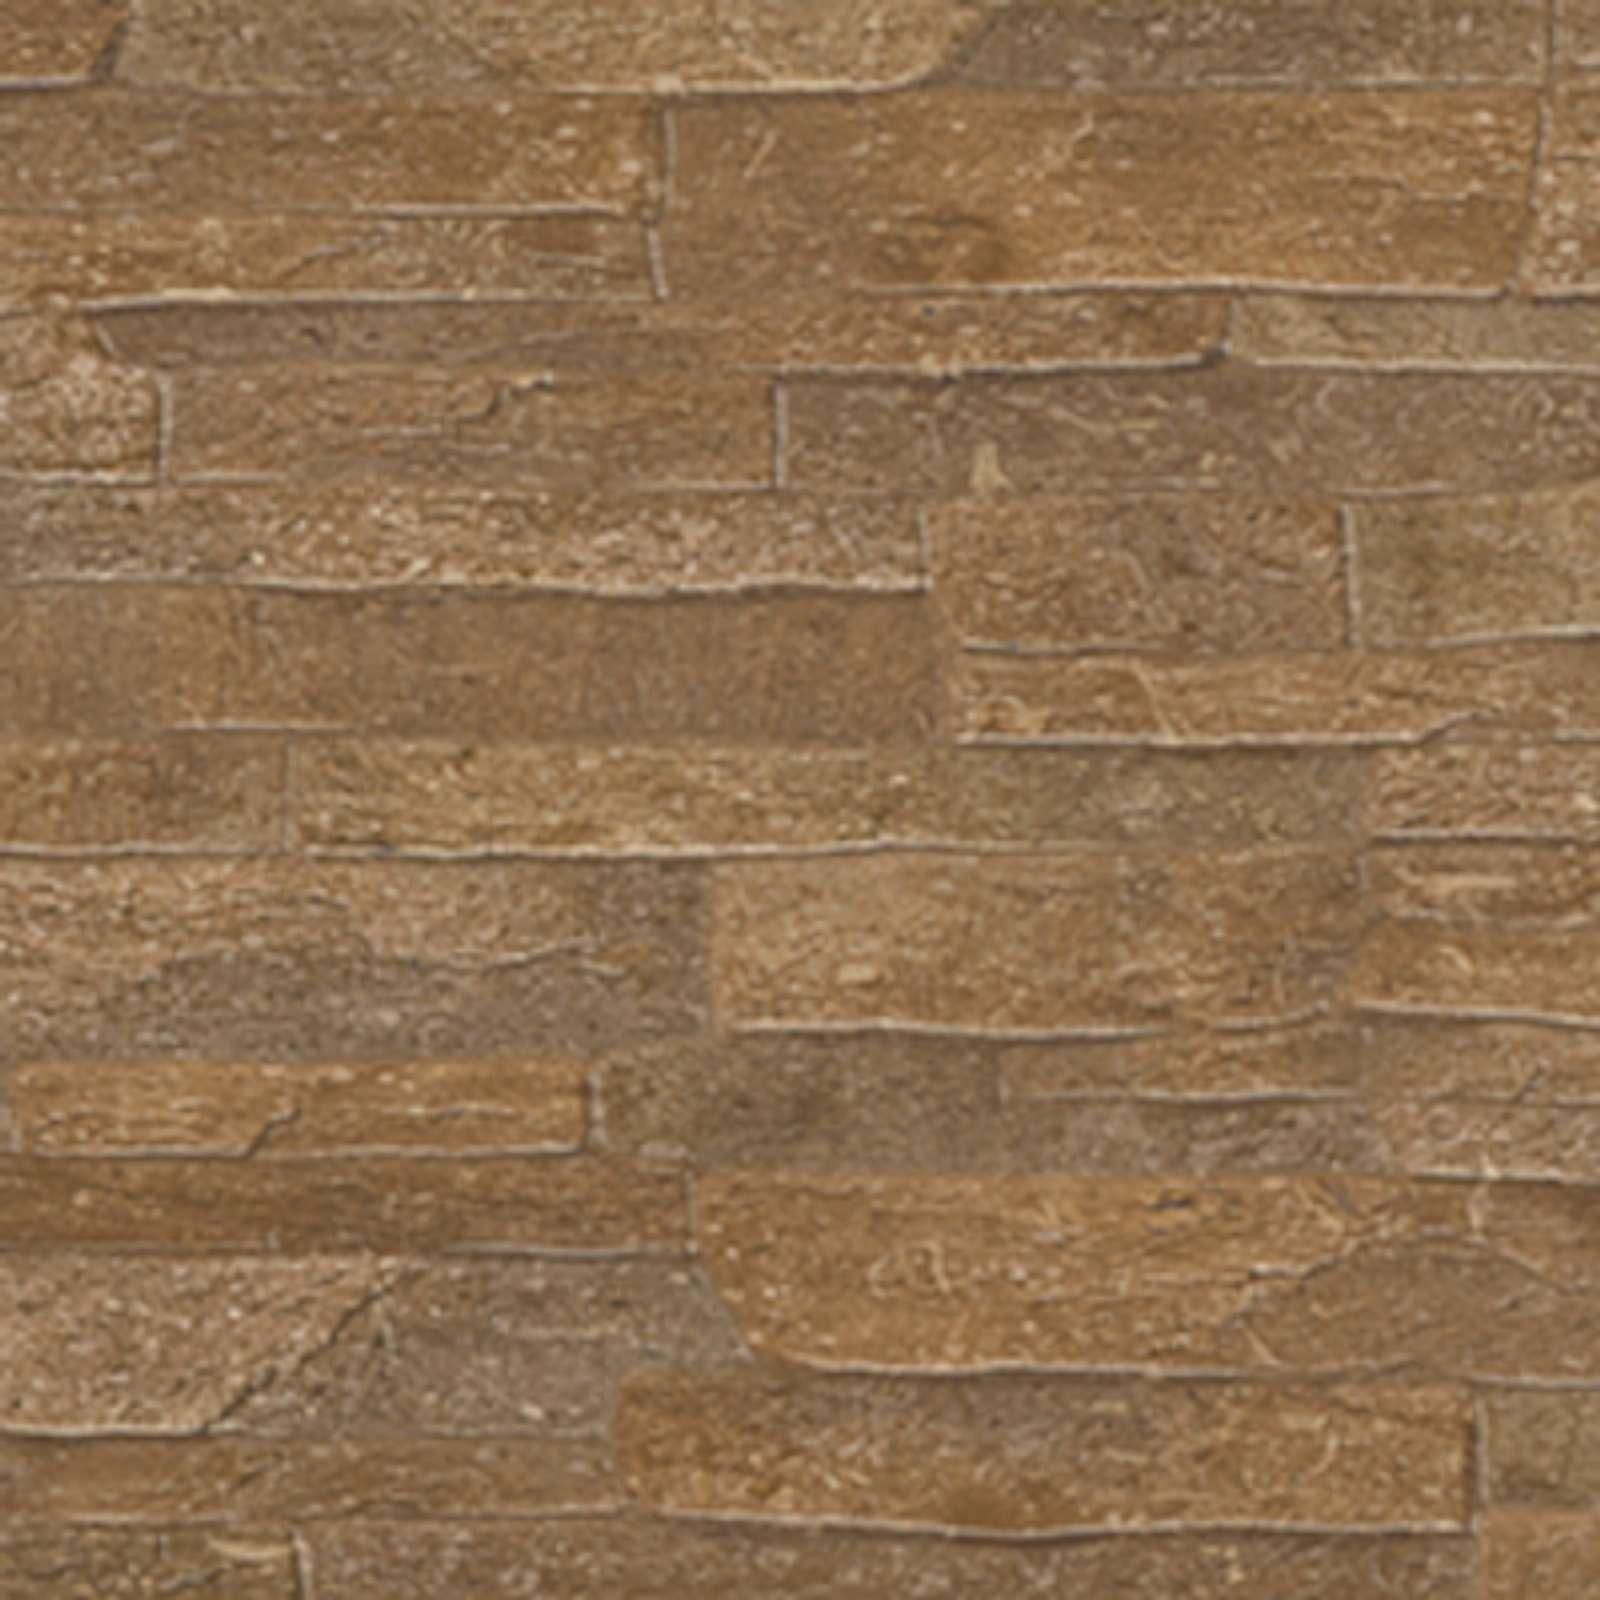 Плитка для пола 200х400мм Bastion brown PG 01, Gracia Ceramica